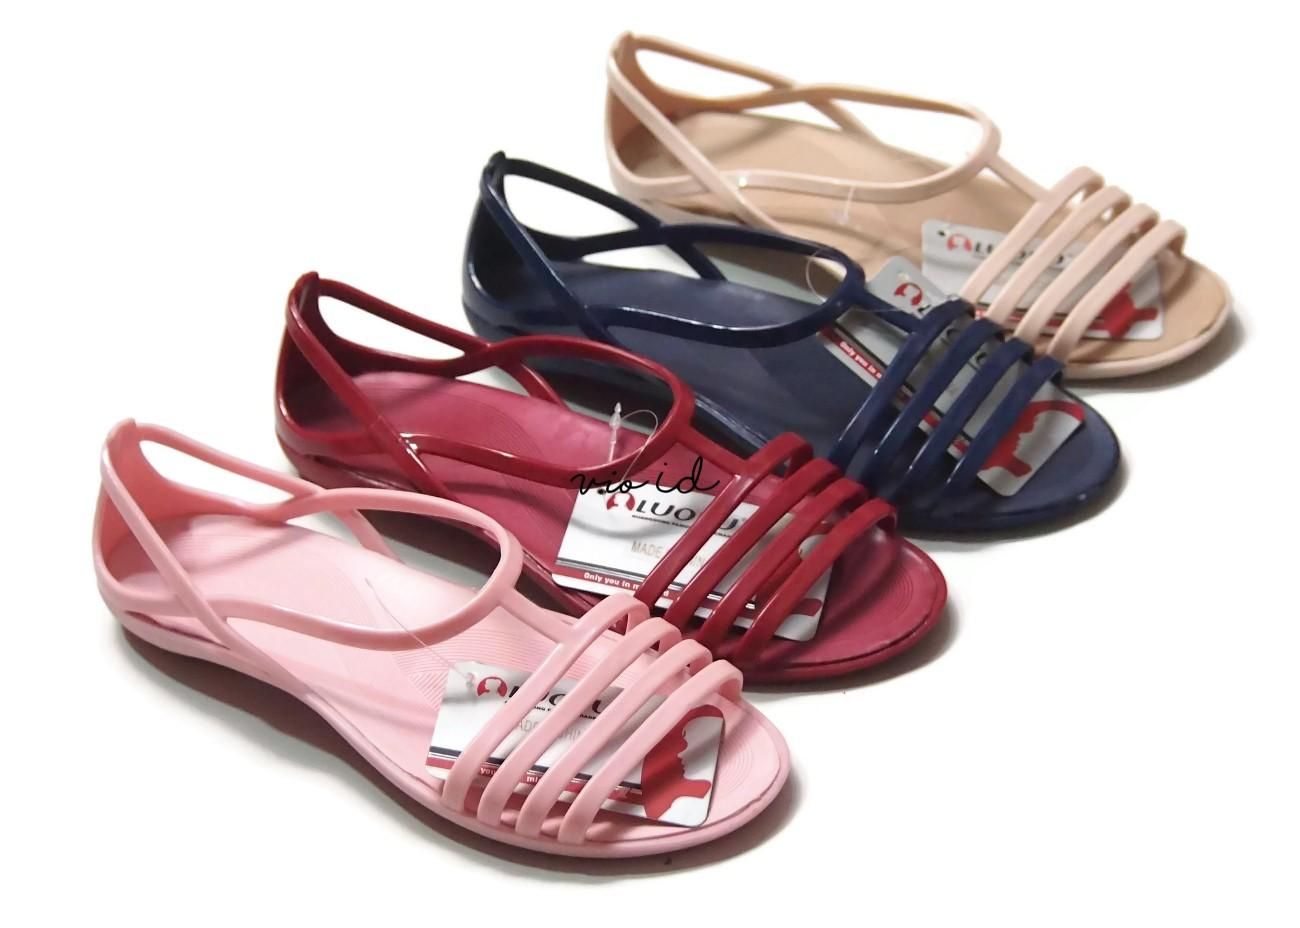 Sandal Jepit Cewek Luofu Sendal Karet Wanita Import Warna Dikirim Acak A031